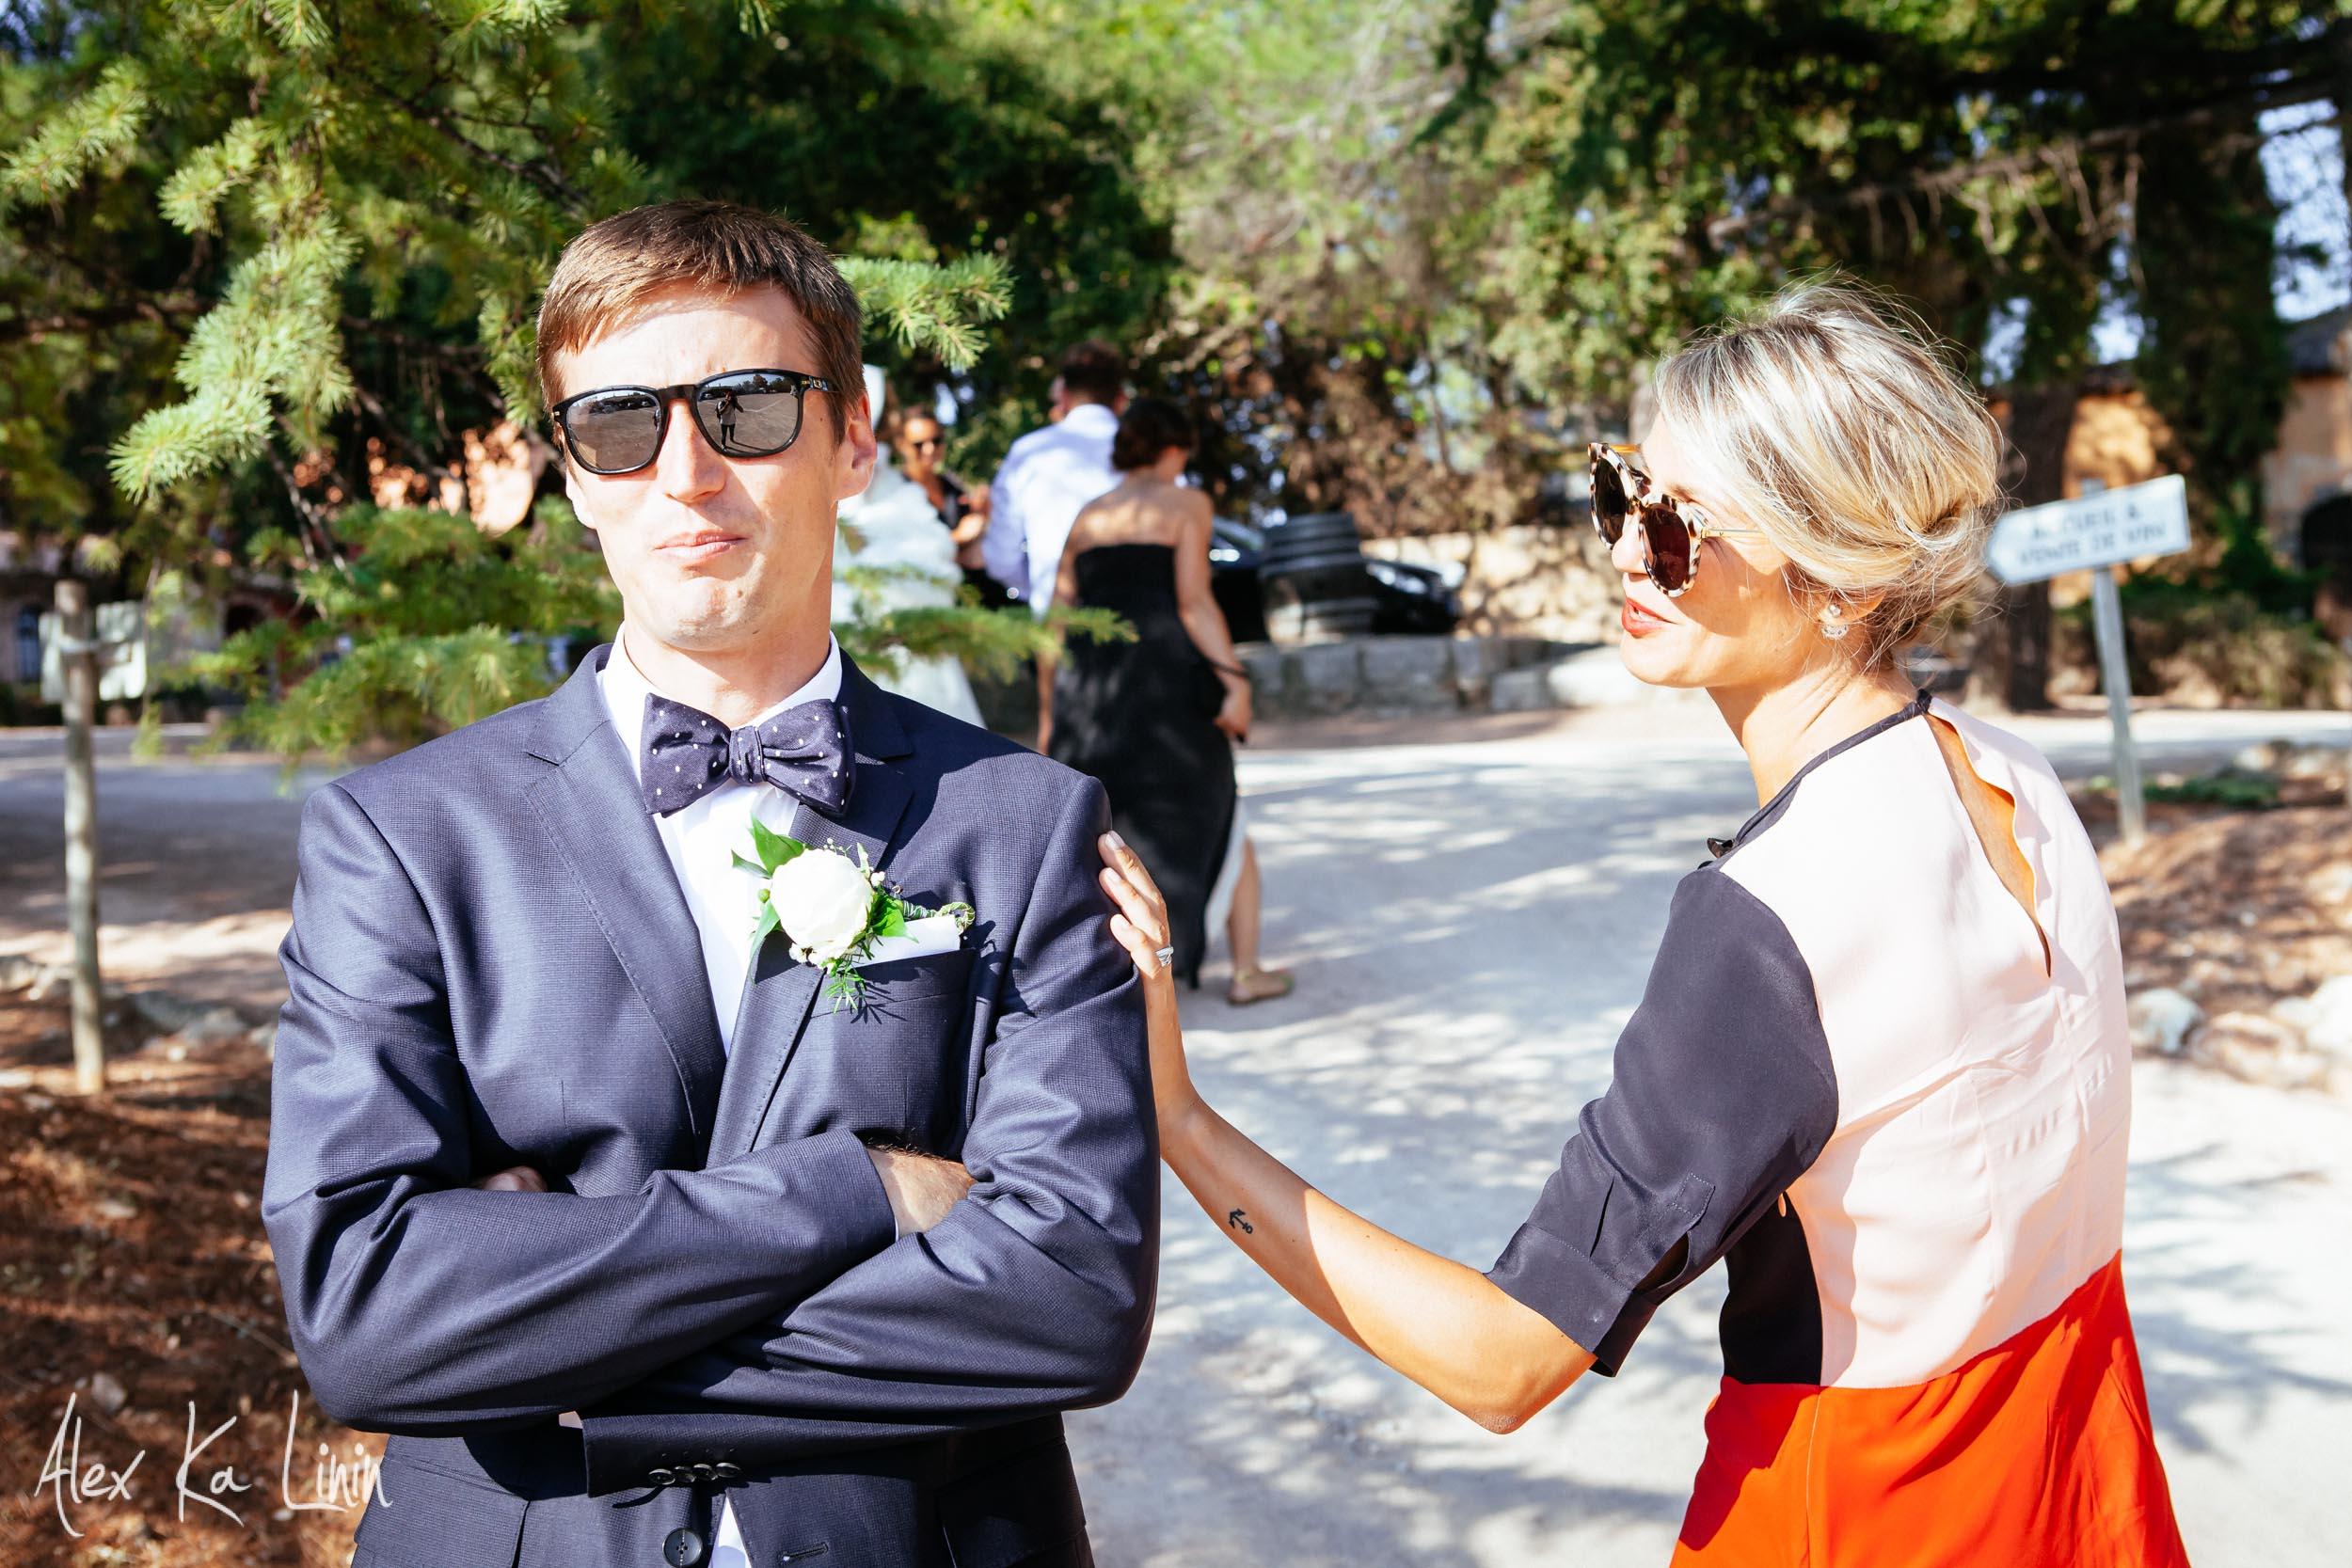 AlexKa_wedding_mariage_photographer-35.jpg